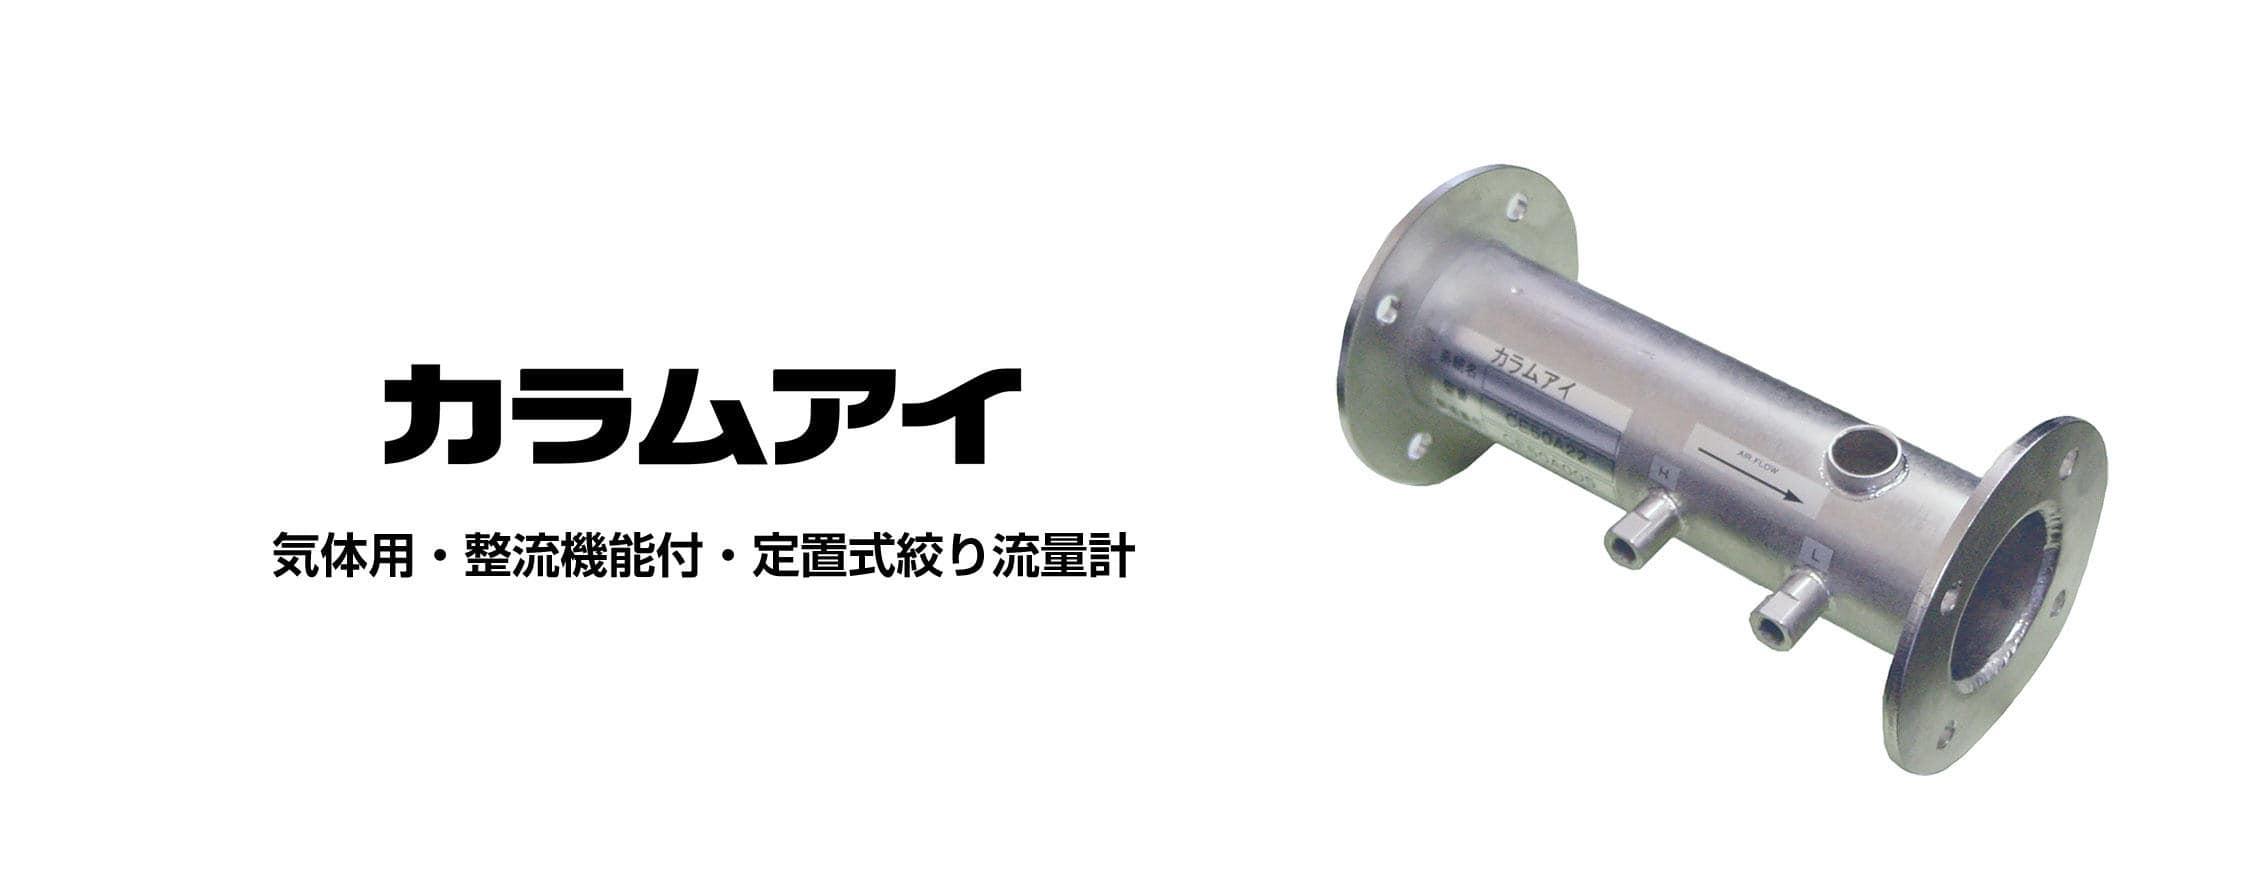 気体用・整流機能付・定置式絞り流量計CEタイプ